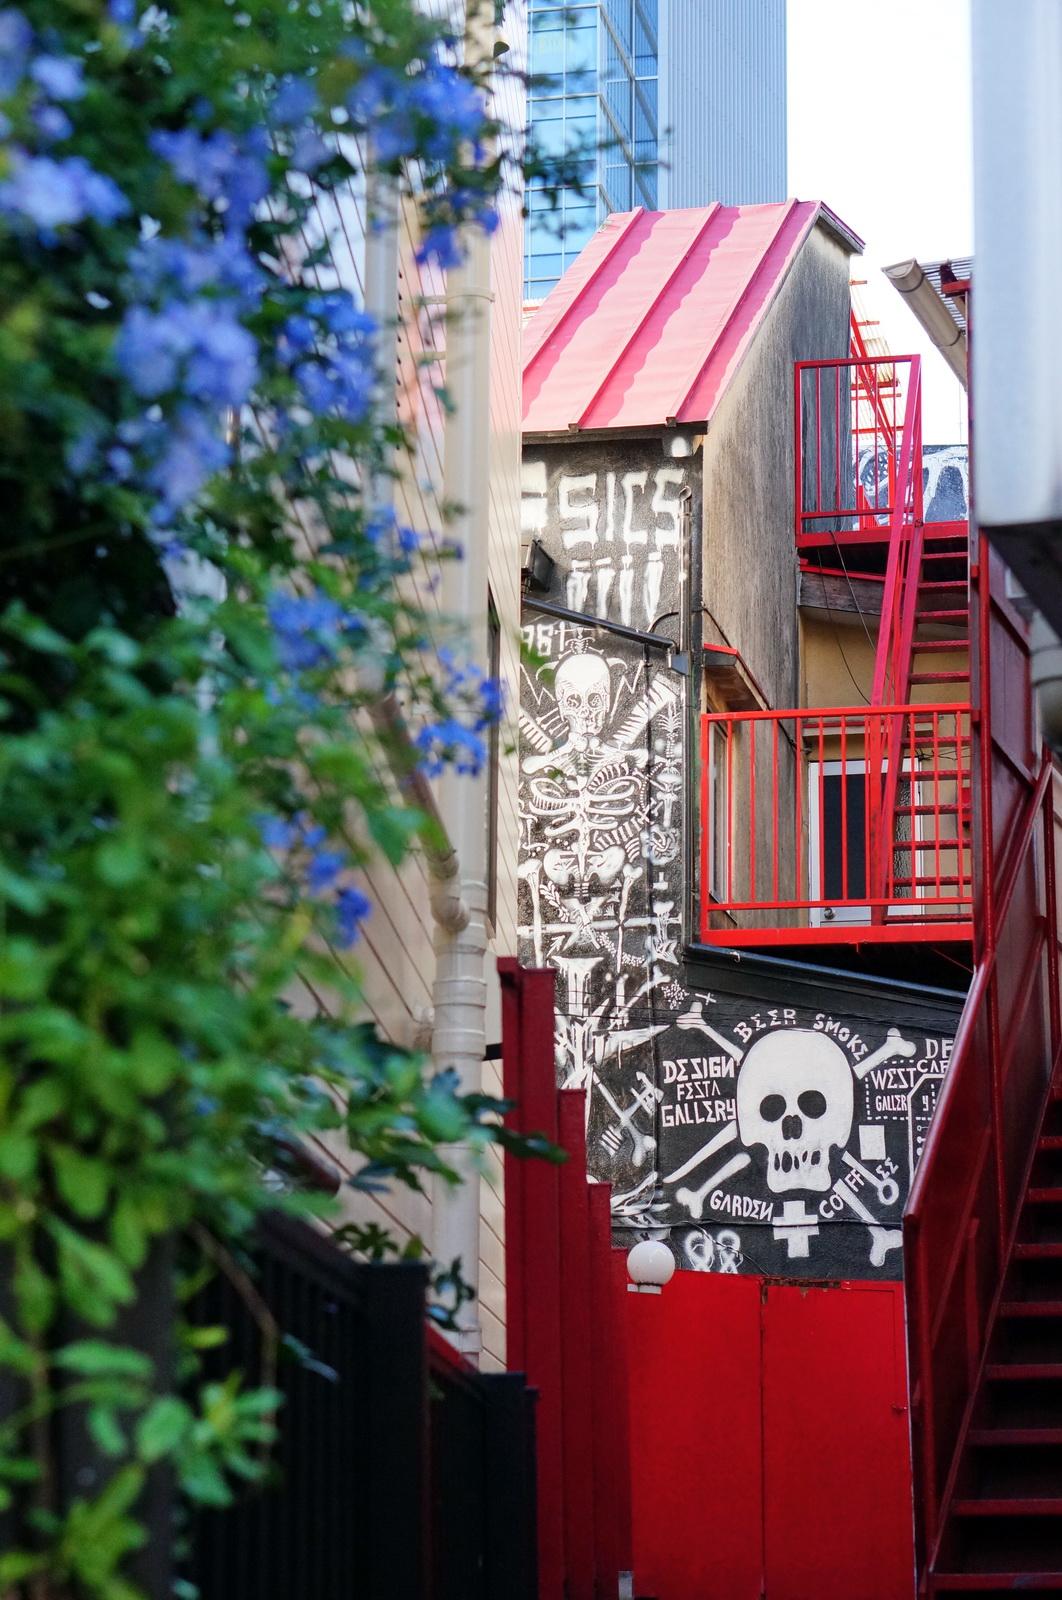 takeshita-dori, takeshita street, tokyo city guide, tokyo, japan, japan trip, street life, japon, voyage au japon, festa design gallery, street art japan, street art tokyo, street art japon